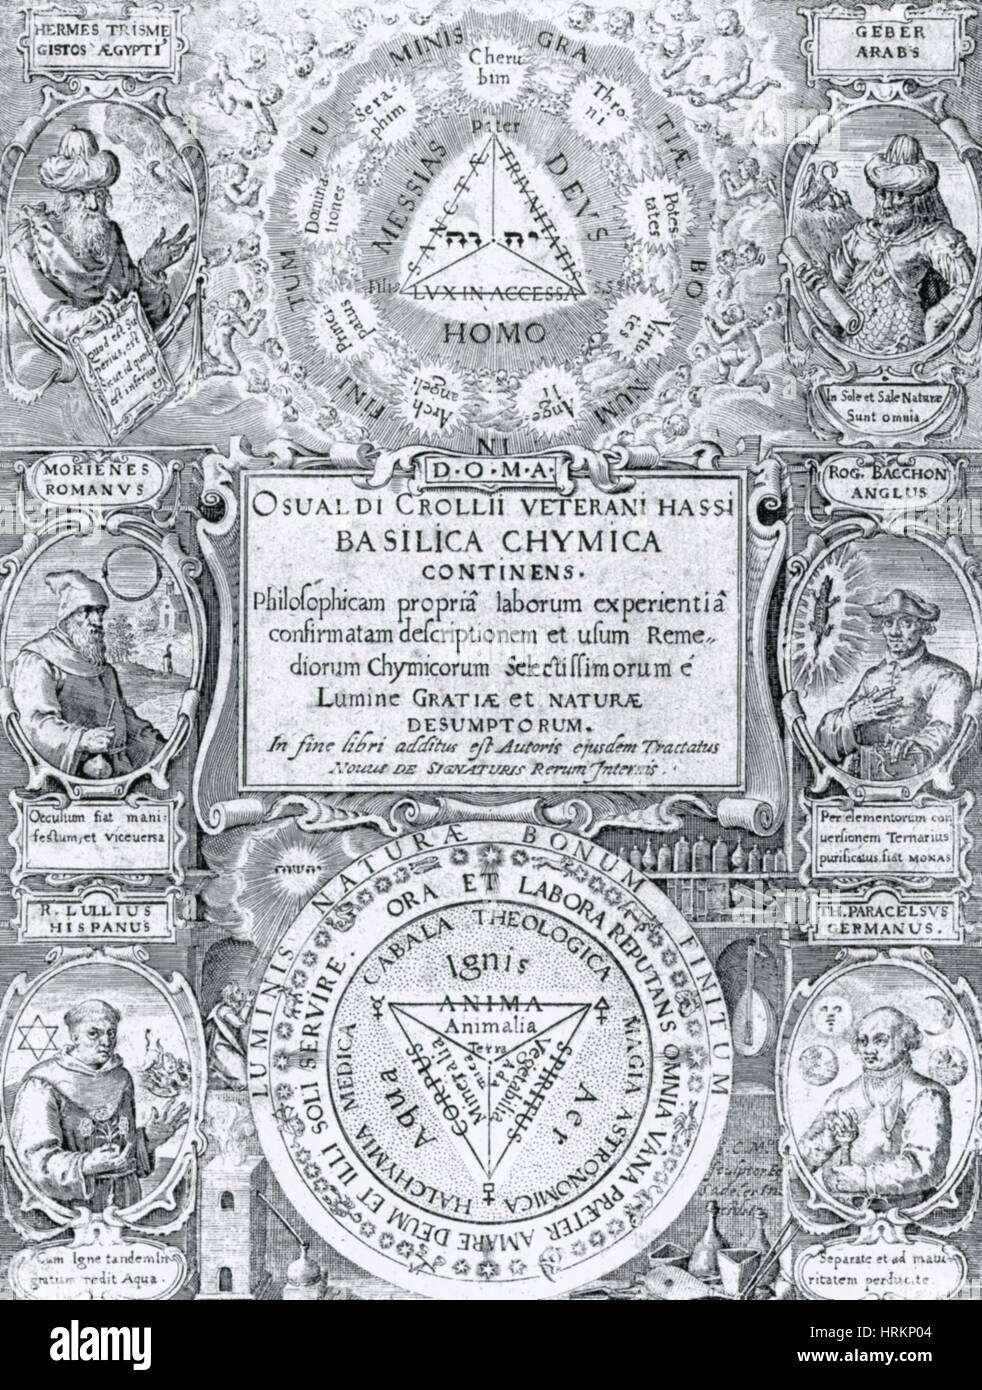 Alchemy Treatise - Stock Image